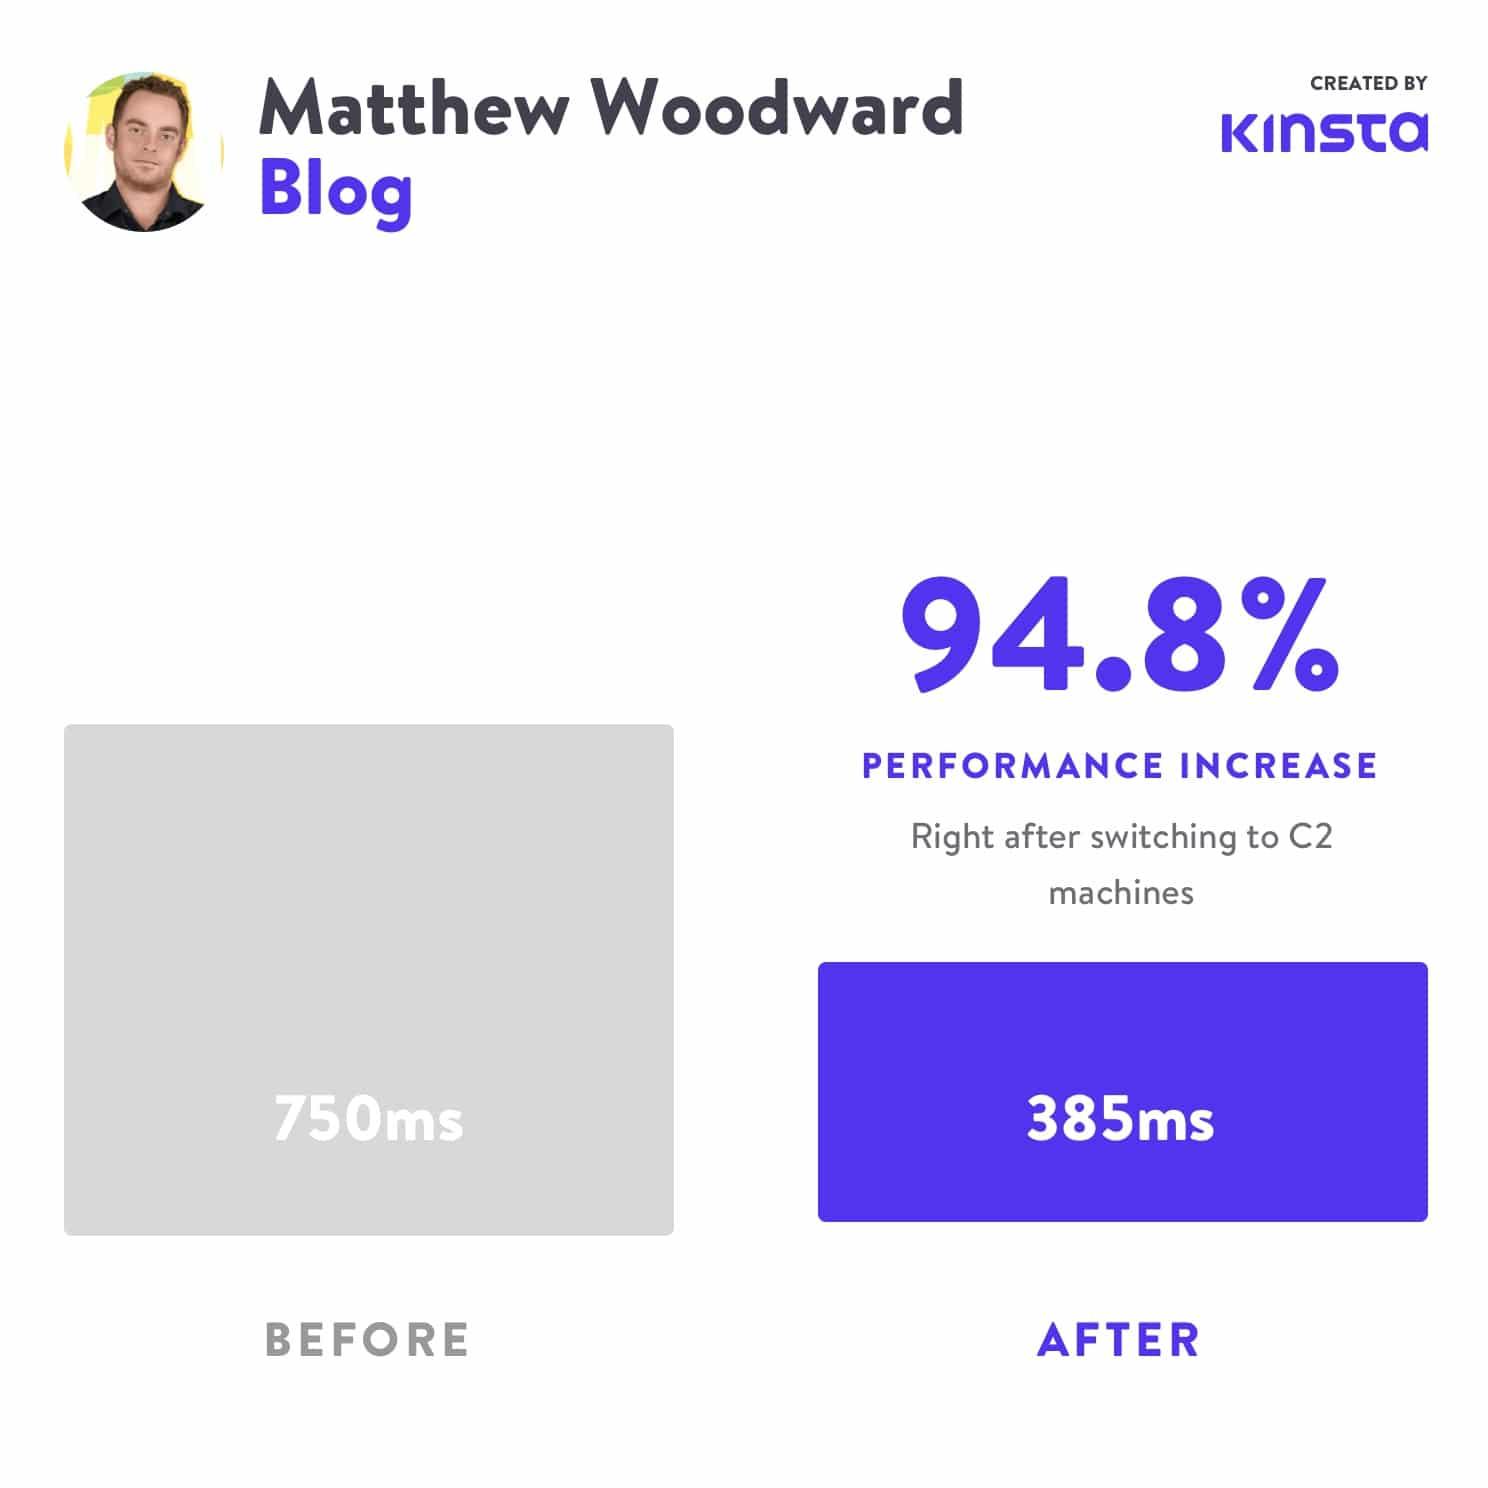 Matthew WoodwardがC2に切り替えた後、パフォーマンスが94.8%向上